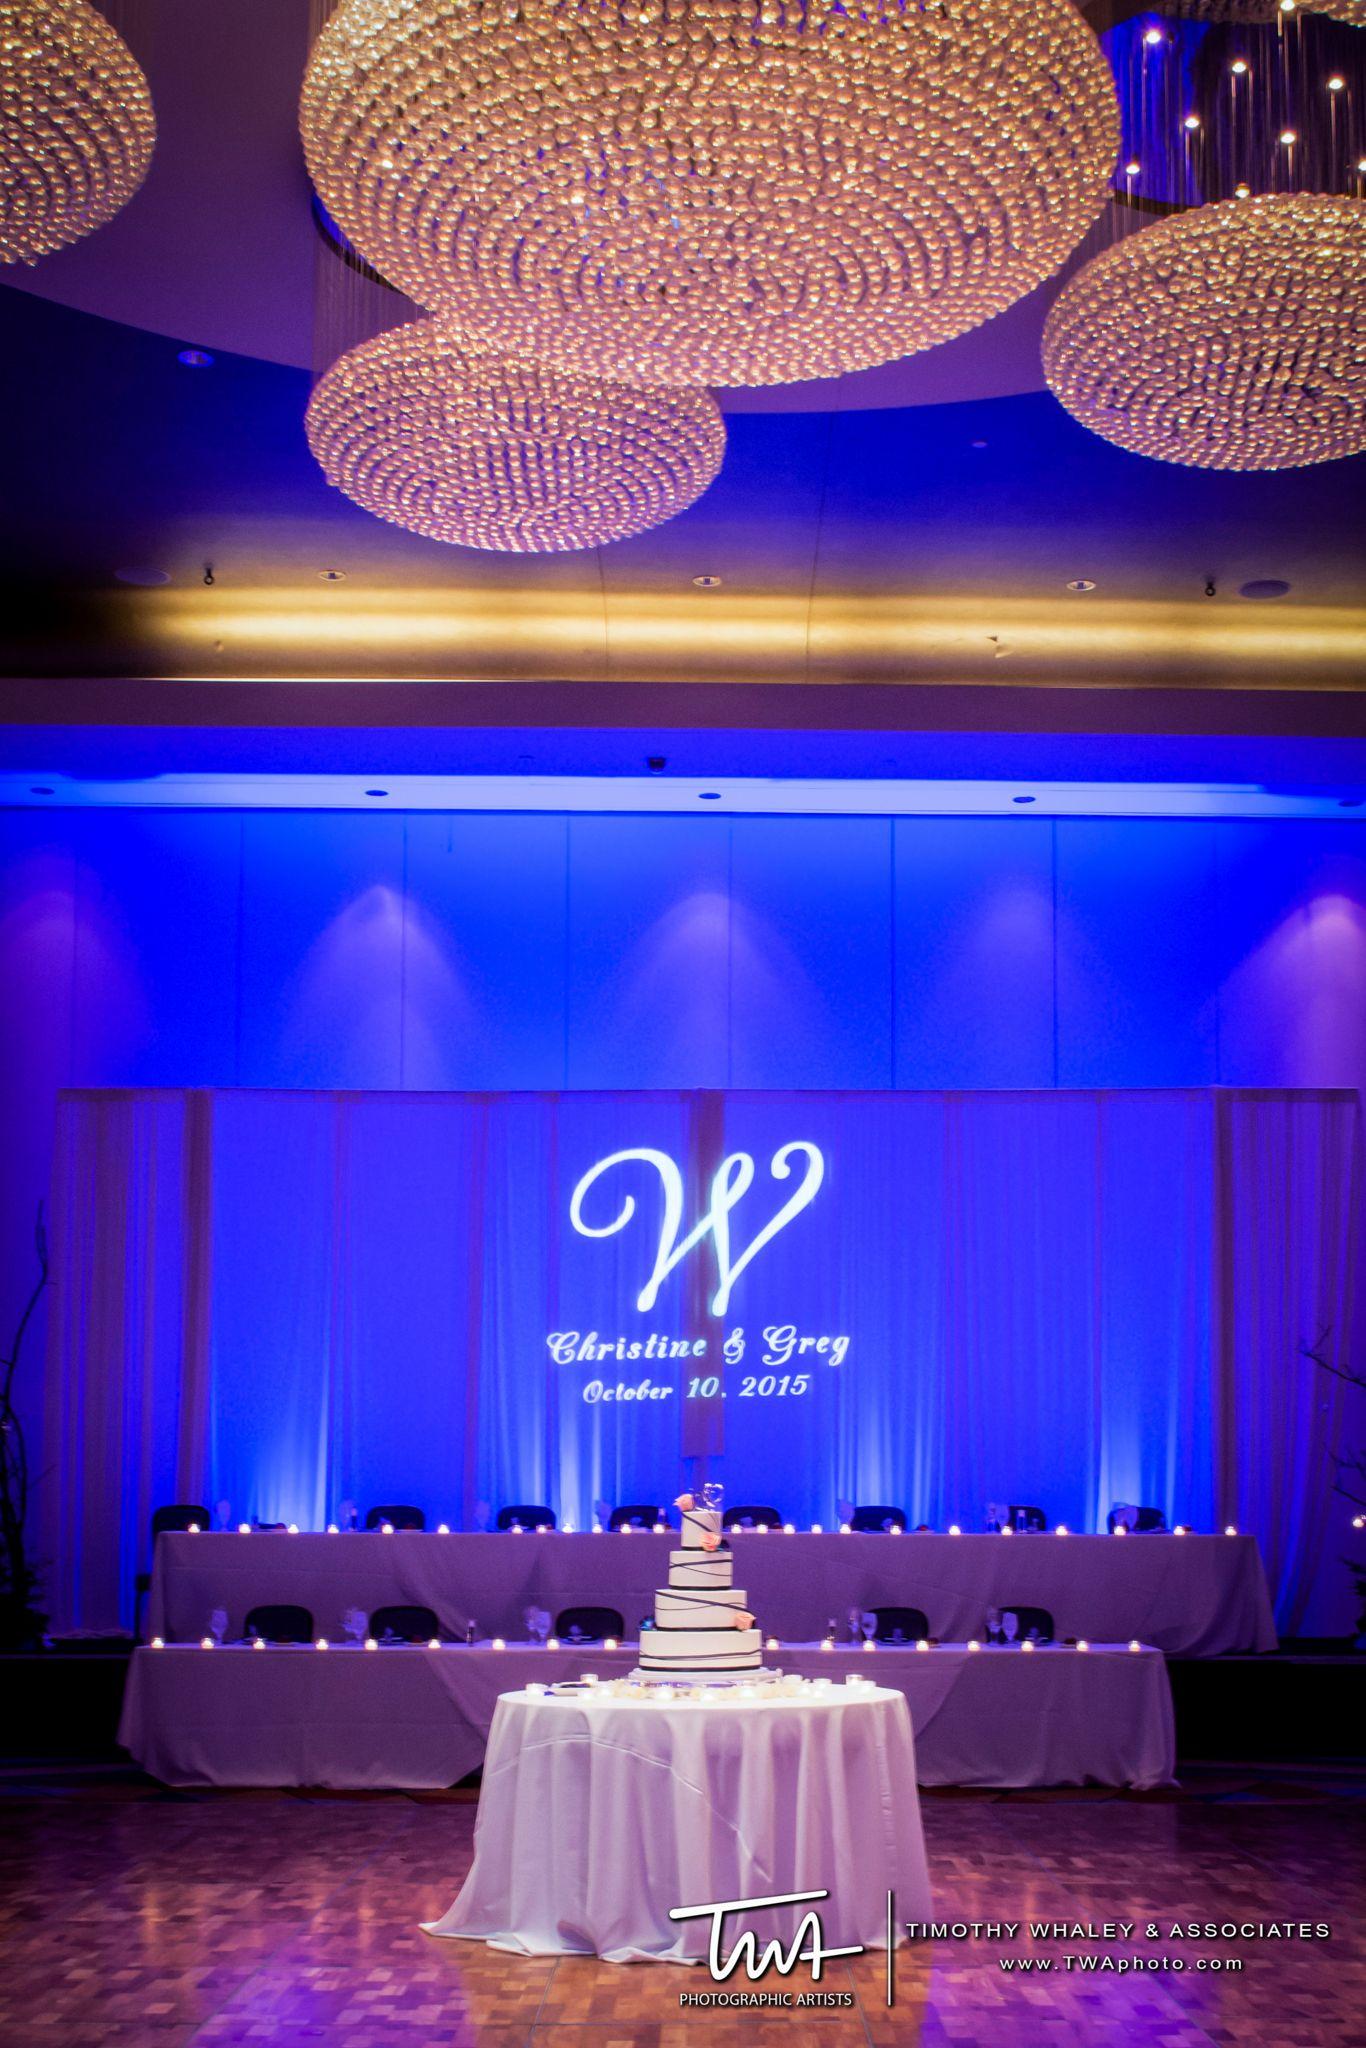 Twa Weddings At Renaissance Schaumburg Hotel Convention Center